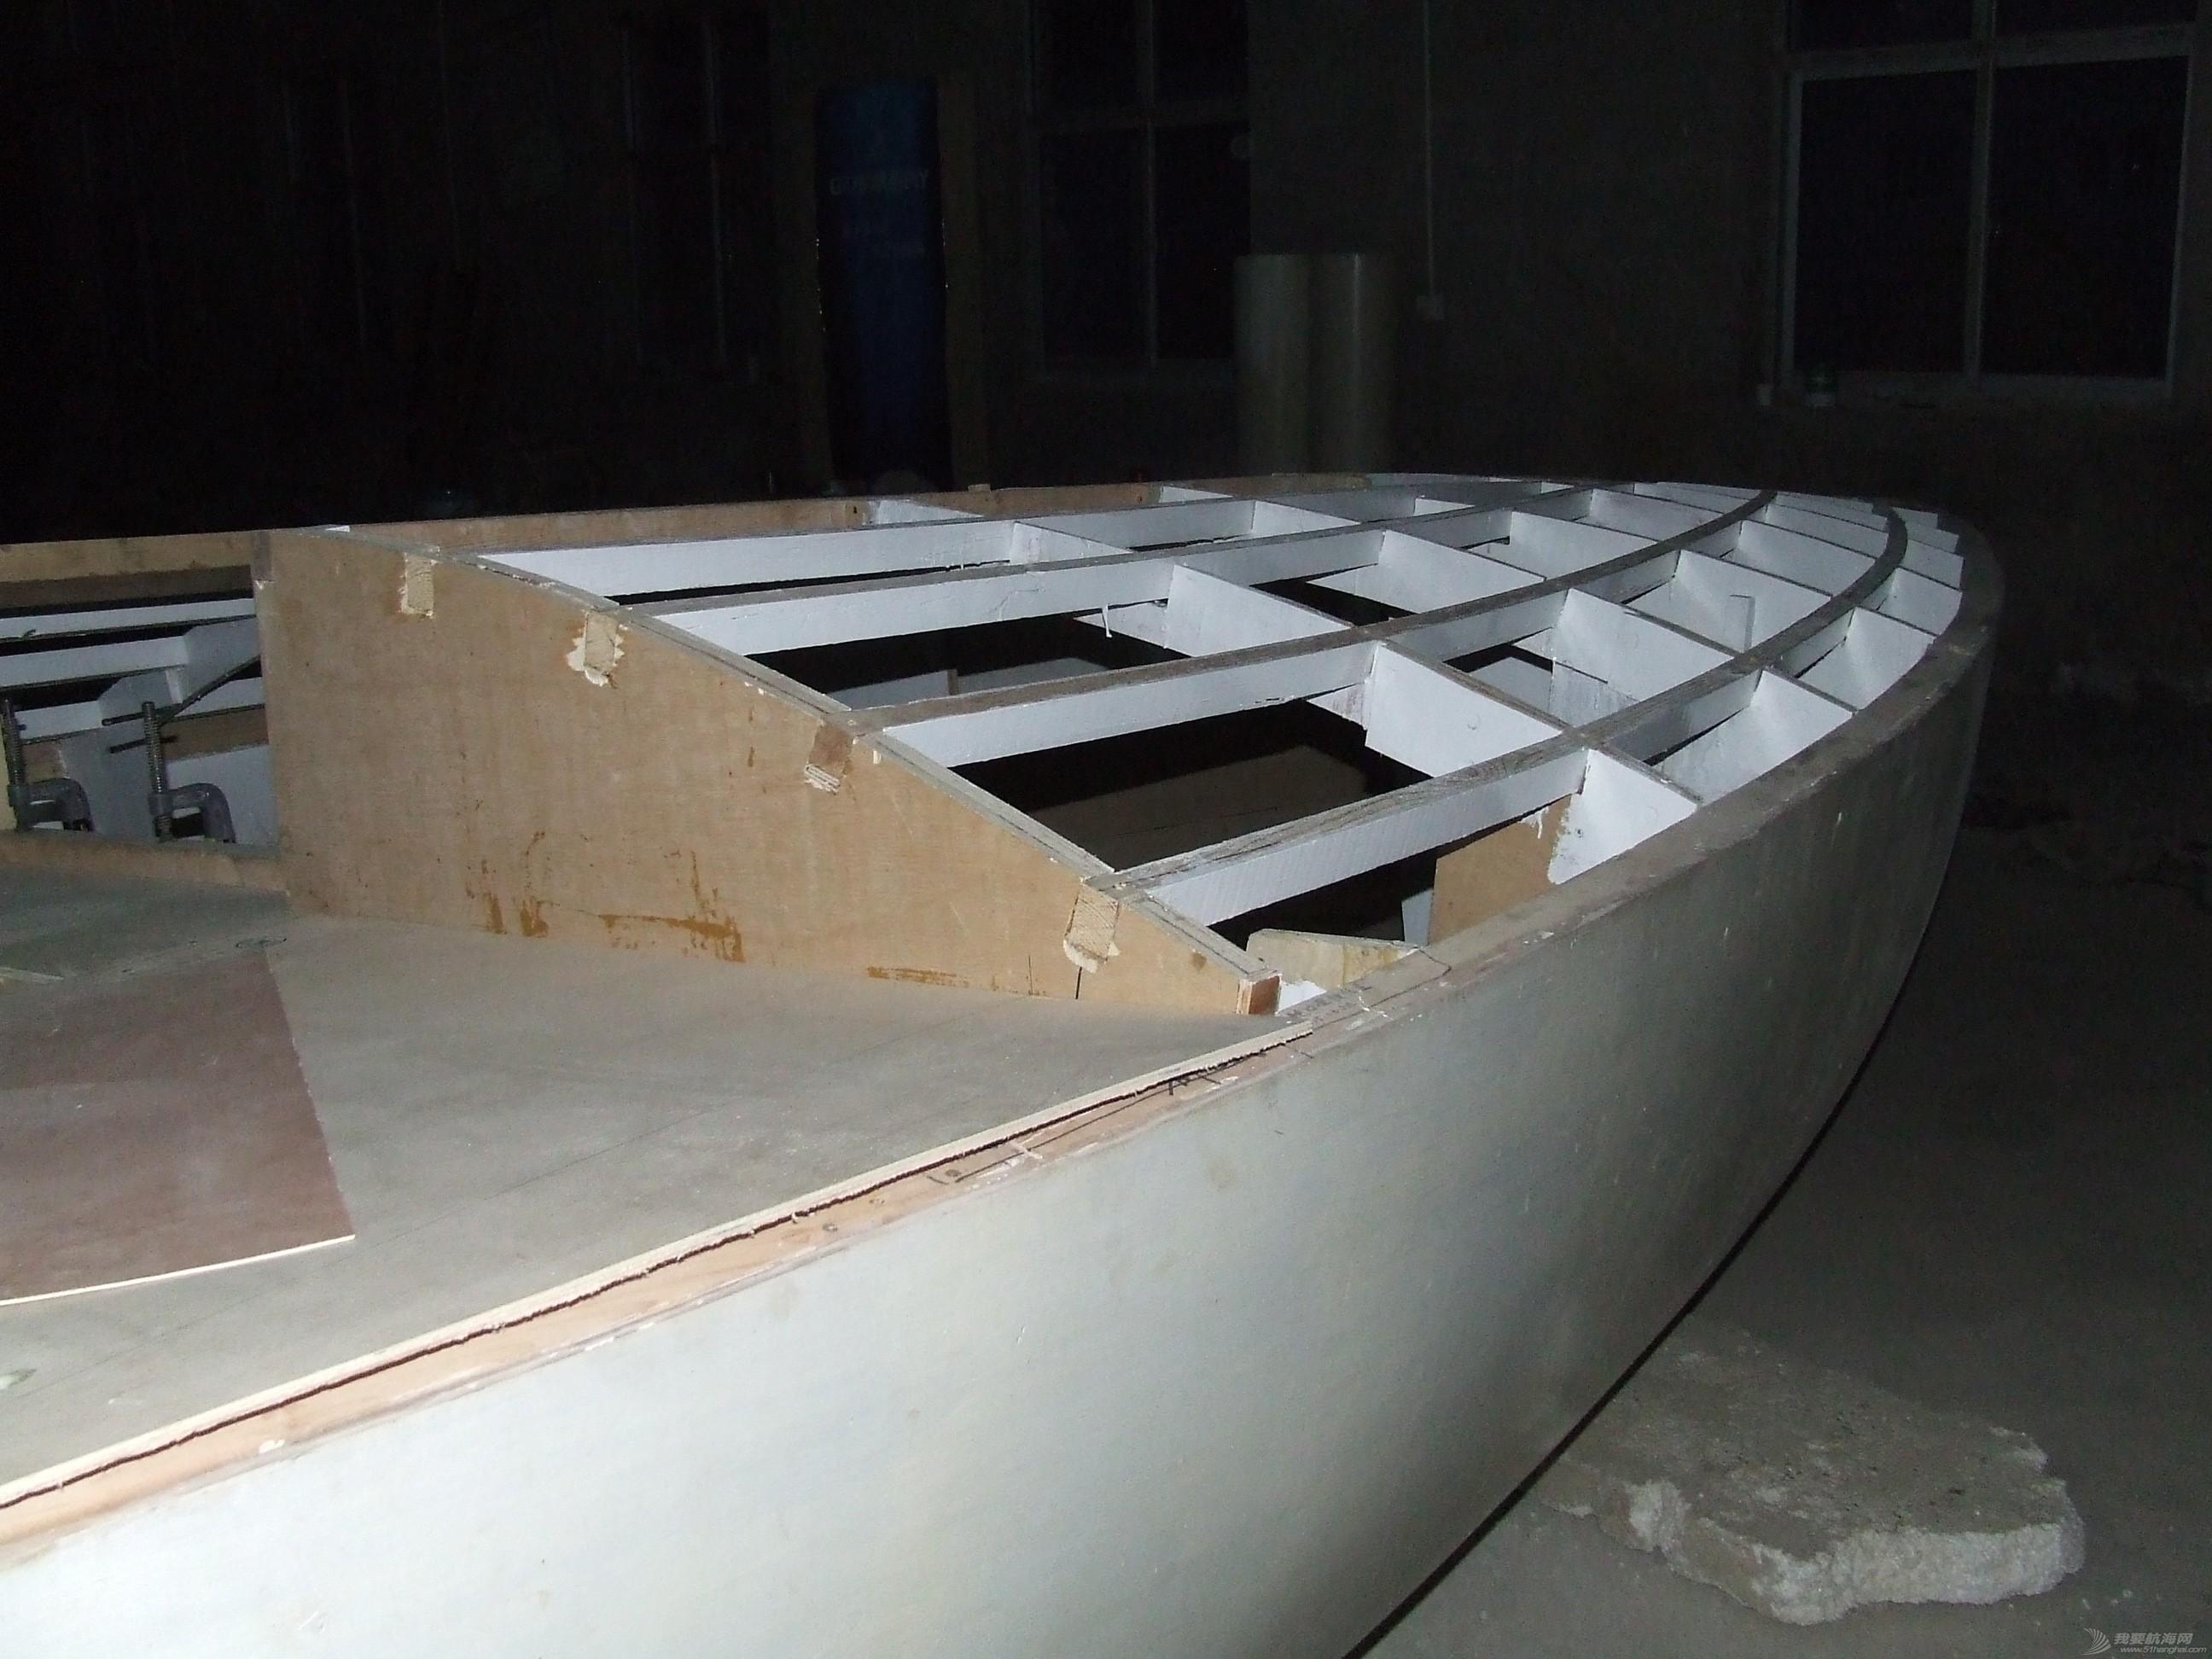 GR-750舱面面板铺装完毕 DSCF5907.JPG